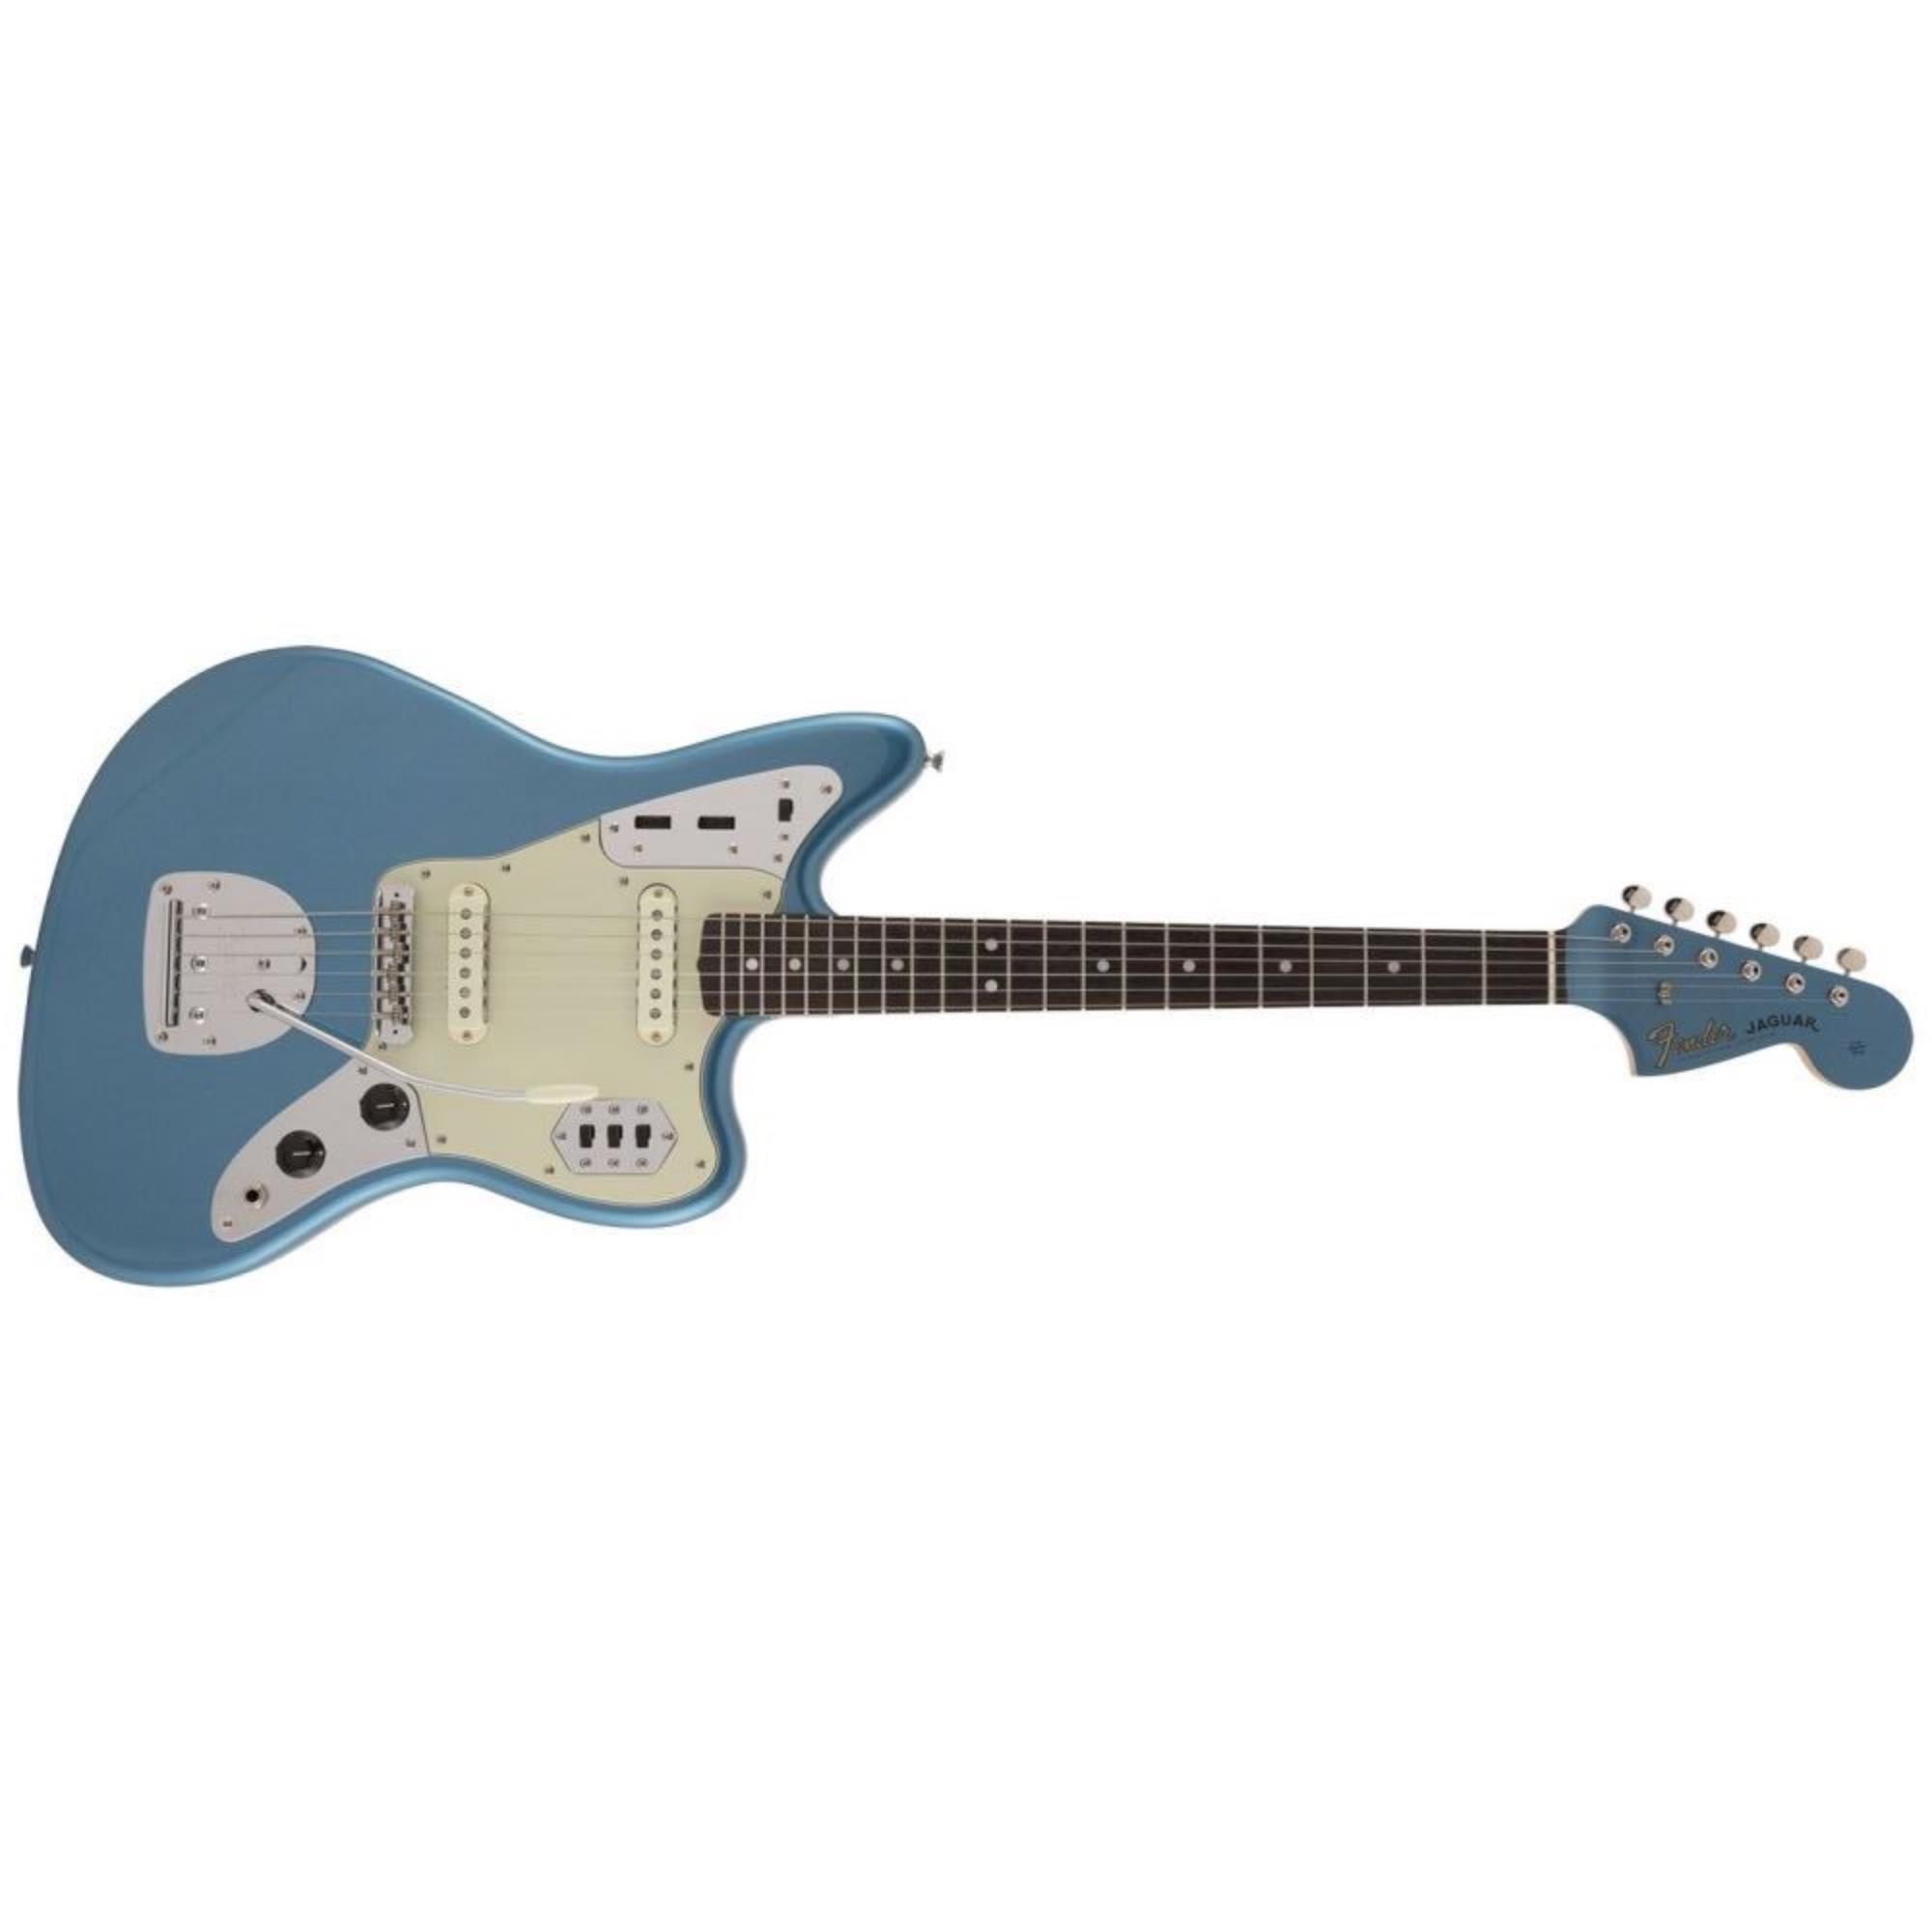 FENDER-Made-in-Japan-Traditional-60s-Jaguar-RW-JAPAN-LTD-Lake-Placid-Blue-5364200302-sku-24557